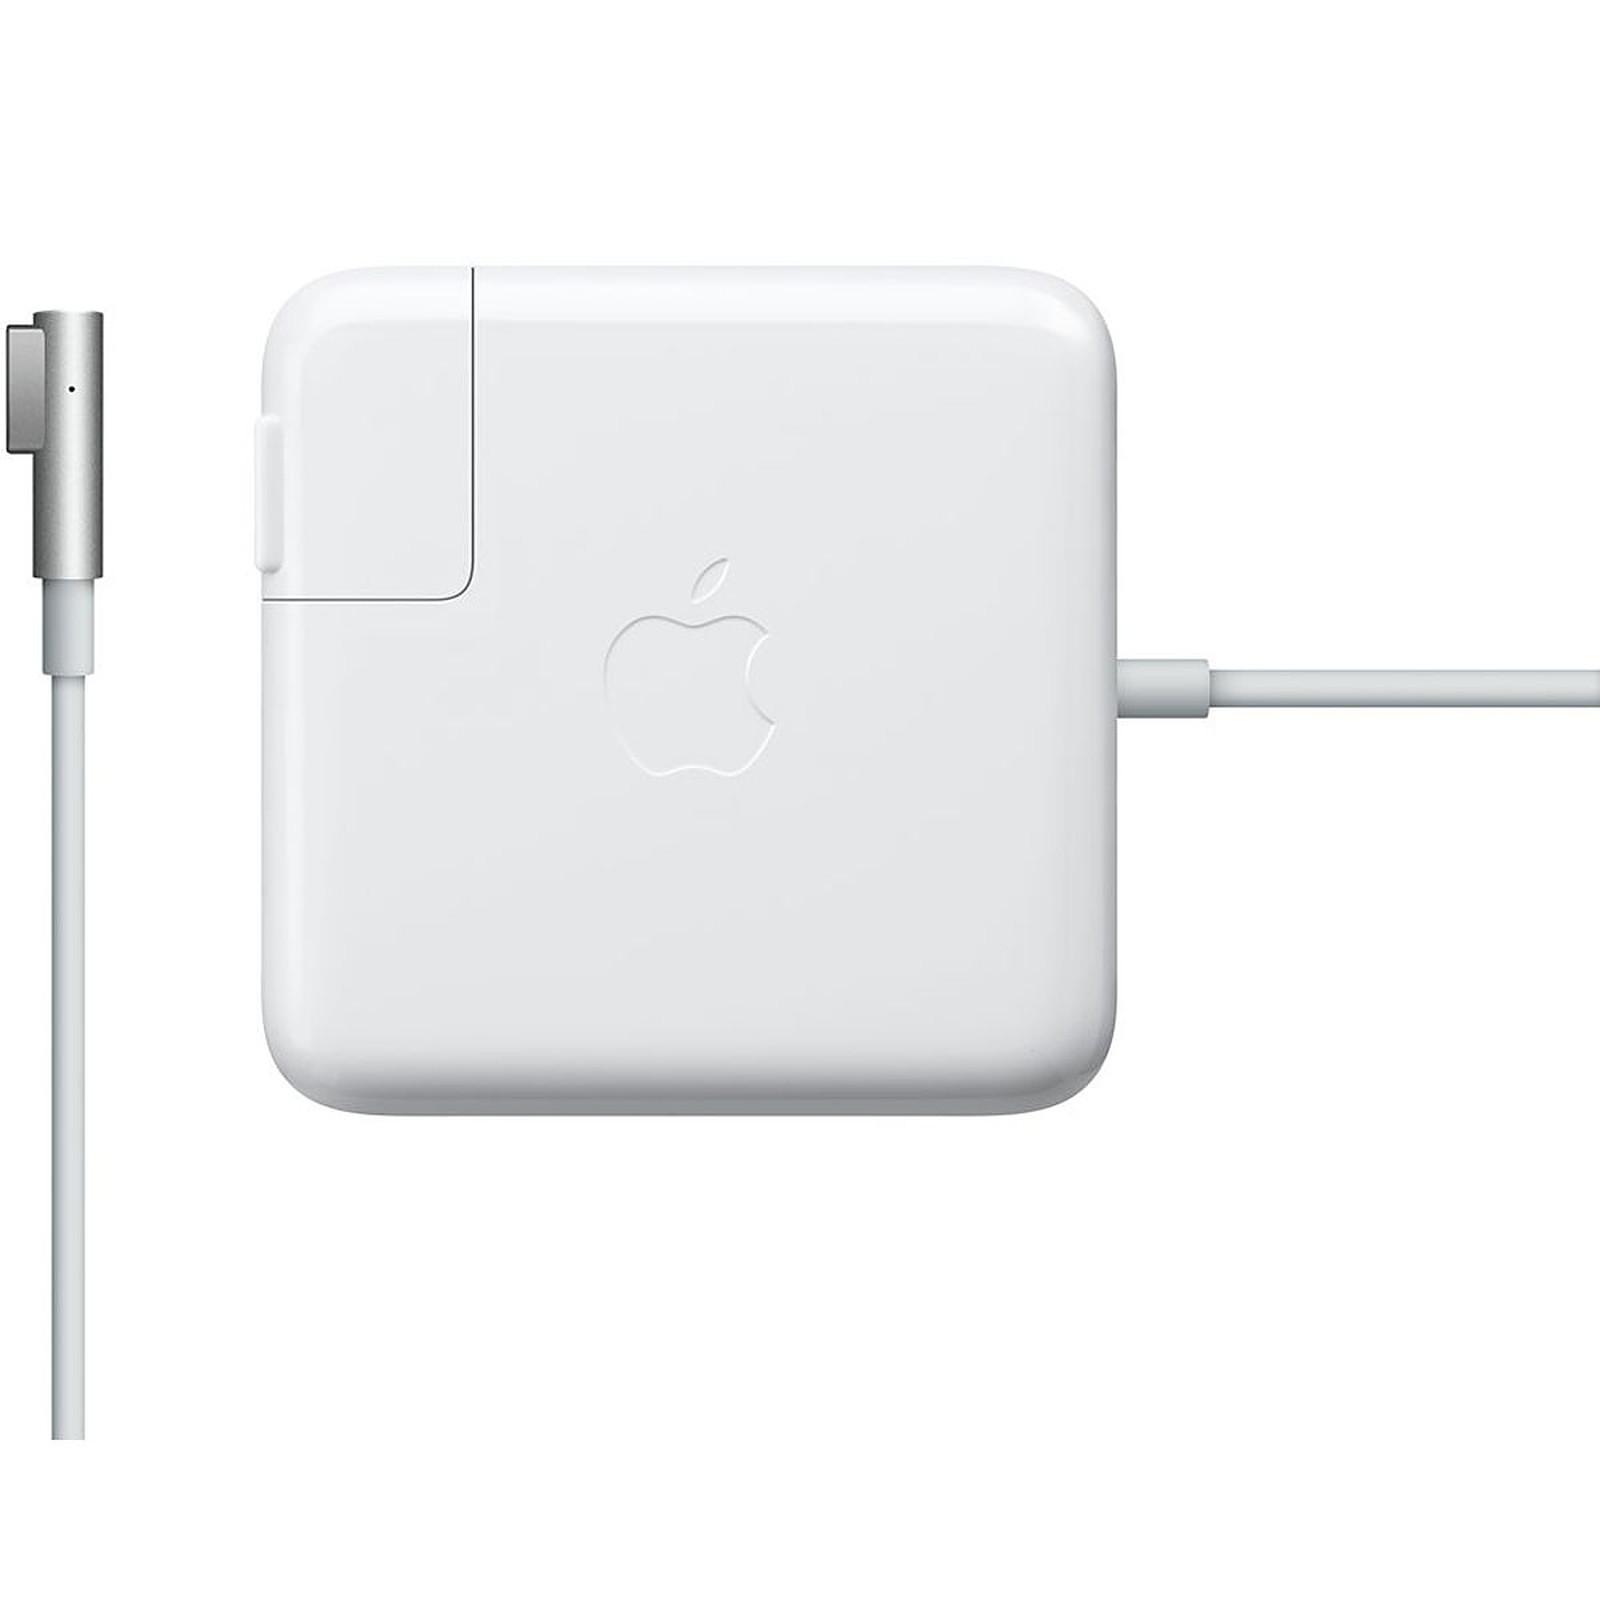 Apple Adaptateur Secteur Magsafe 85 W